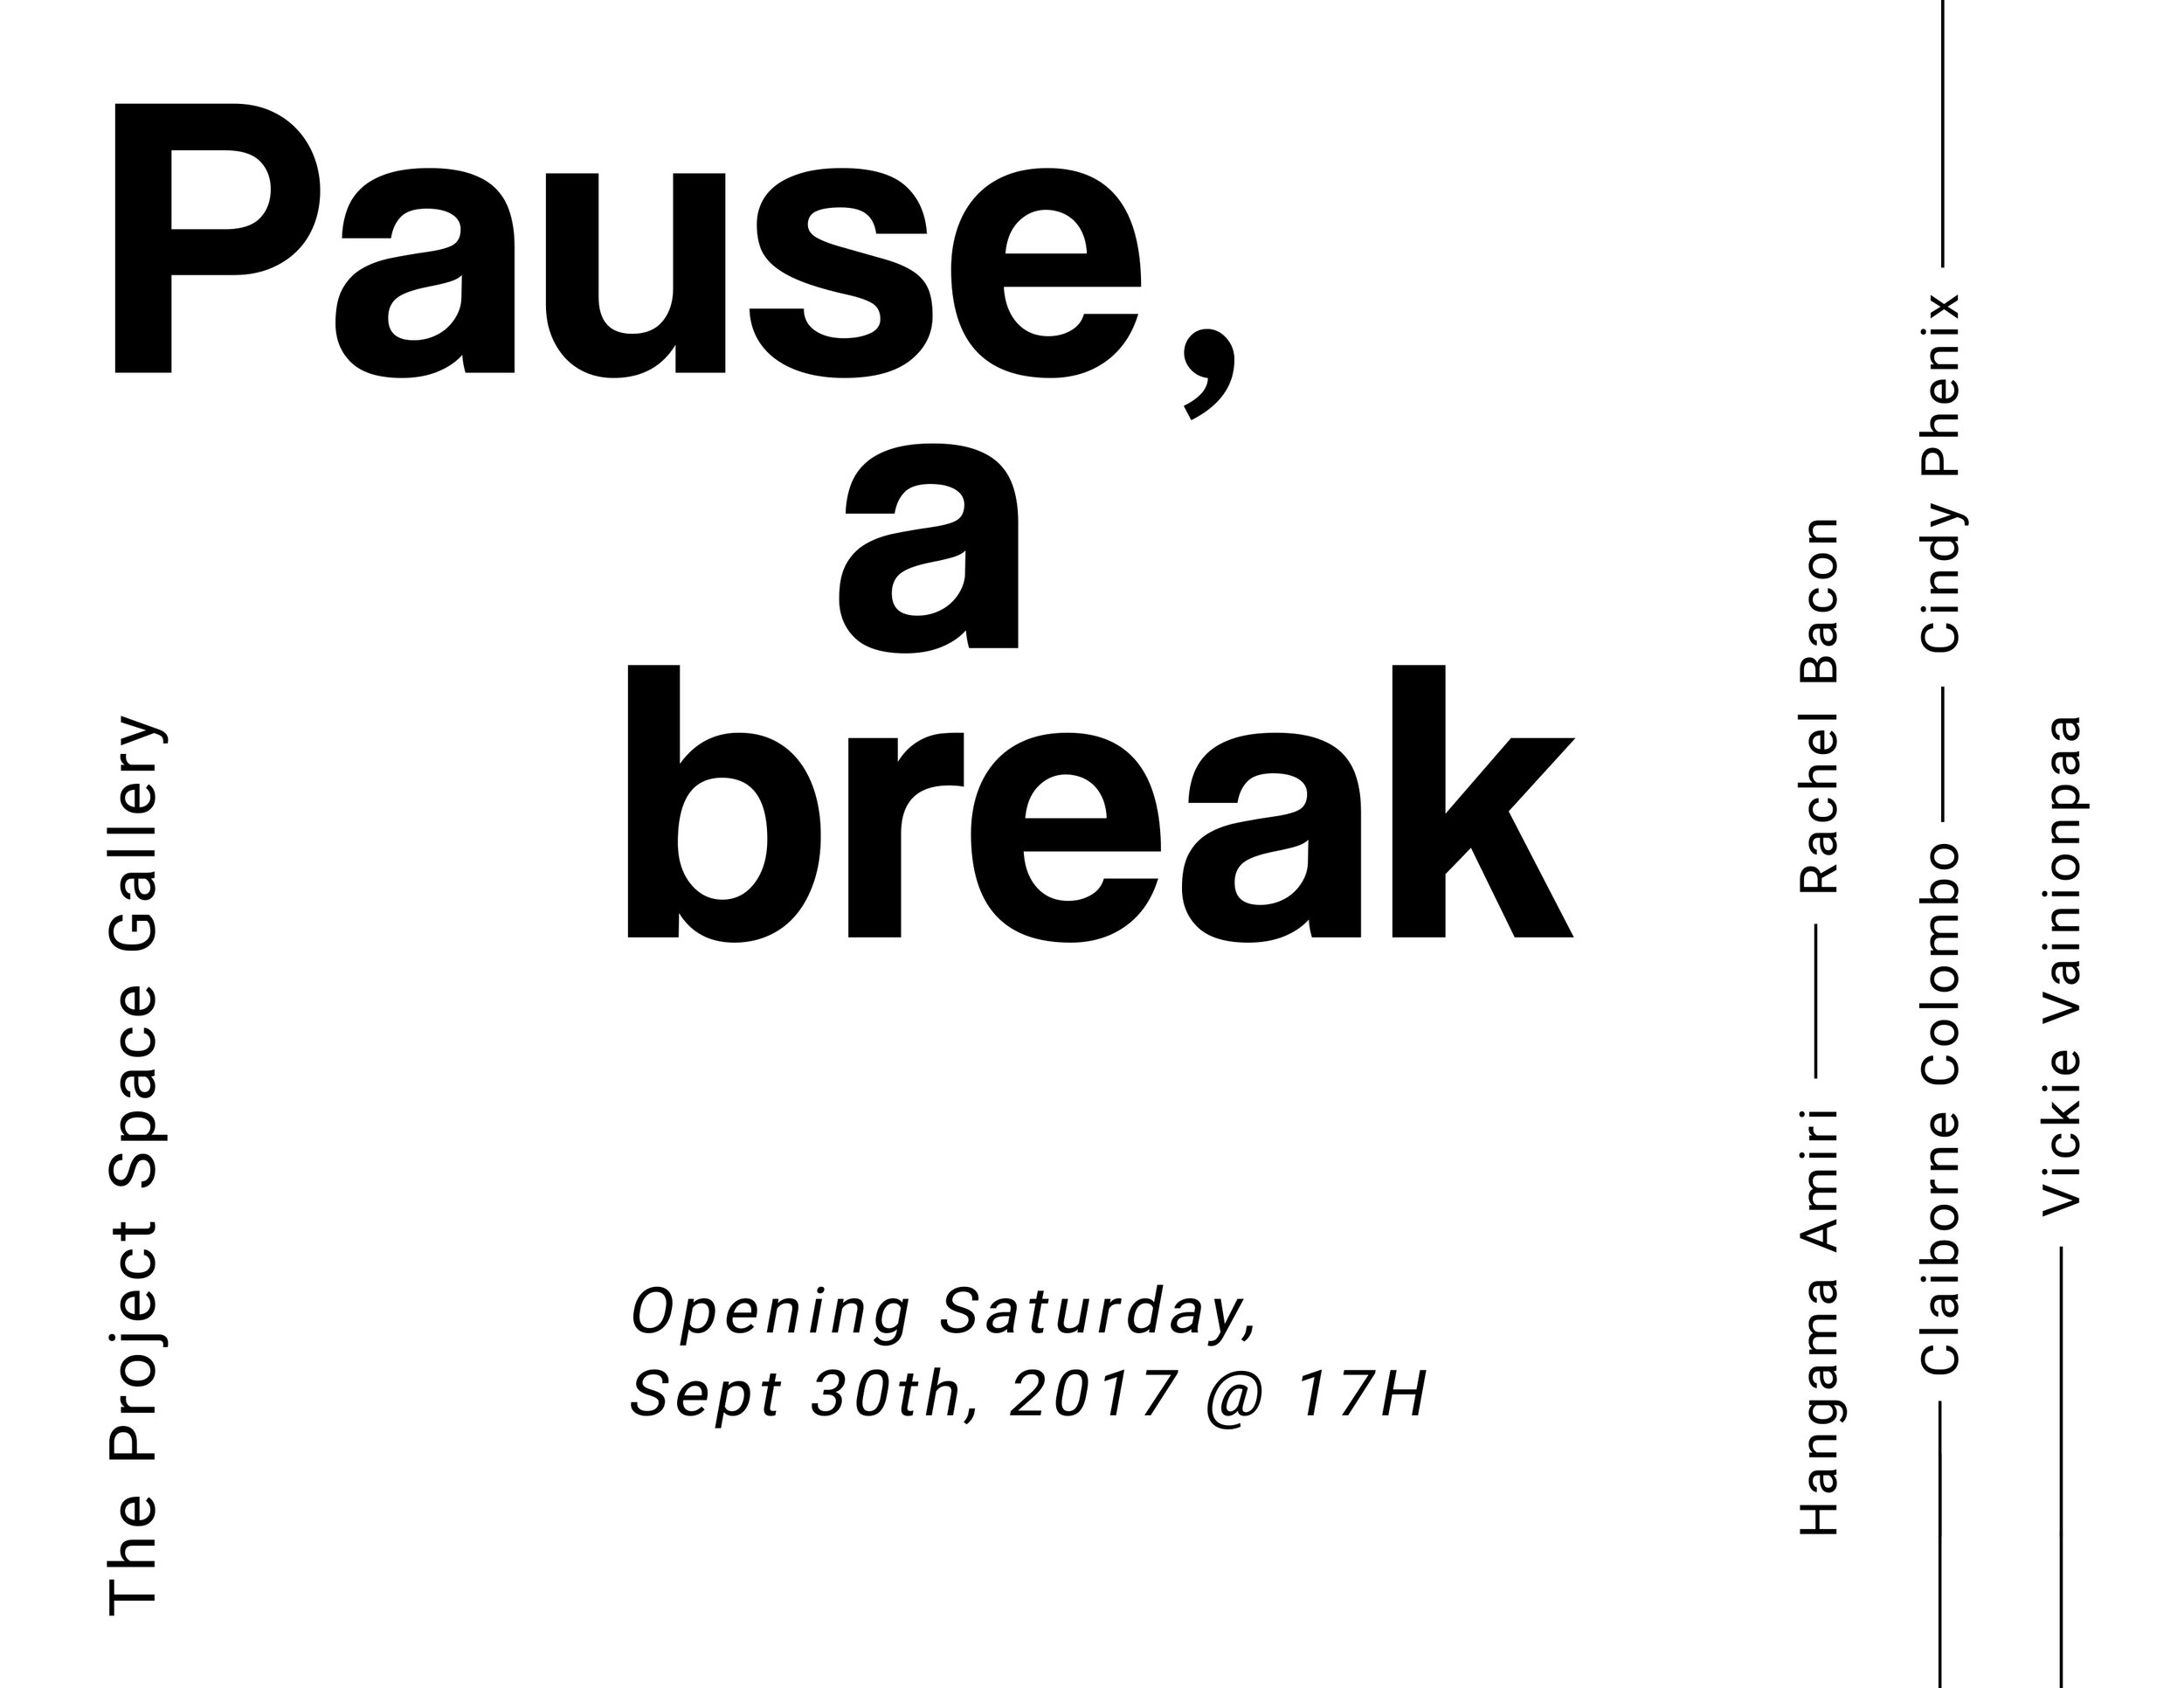 pause_poster.jpg